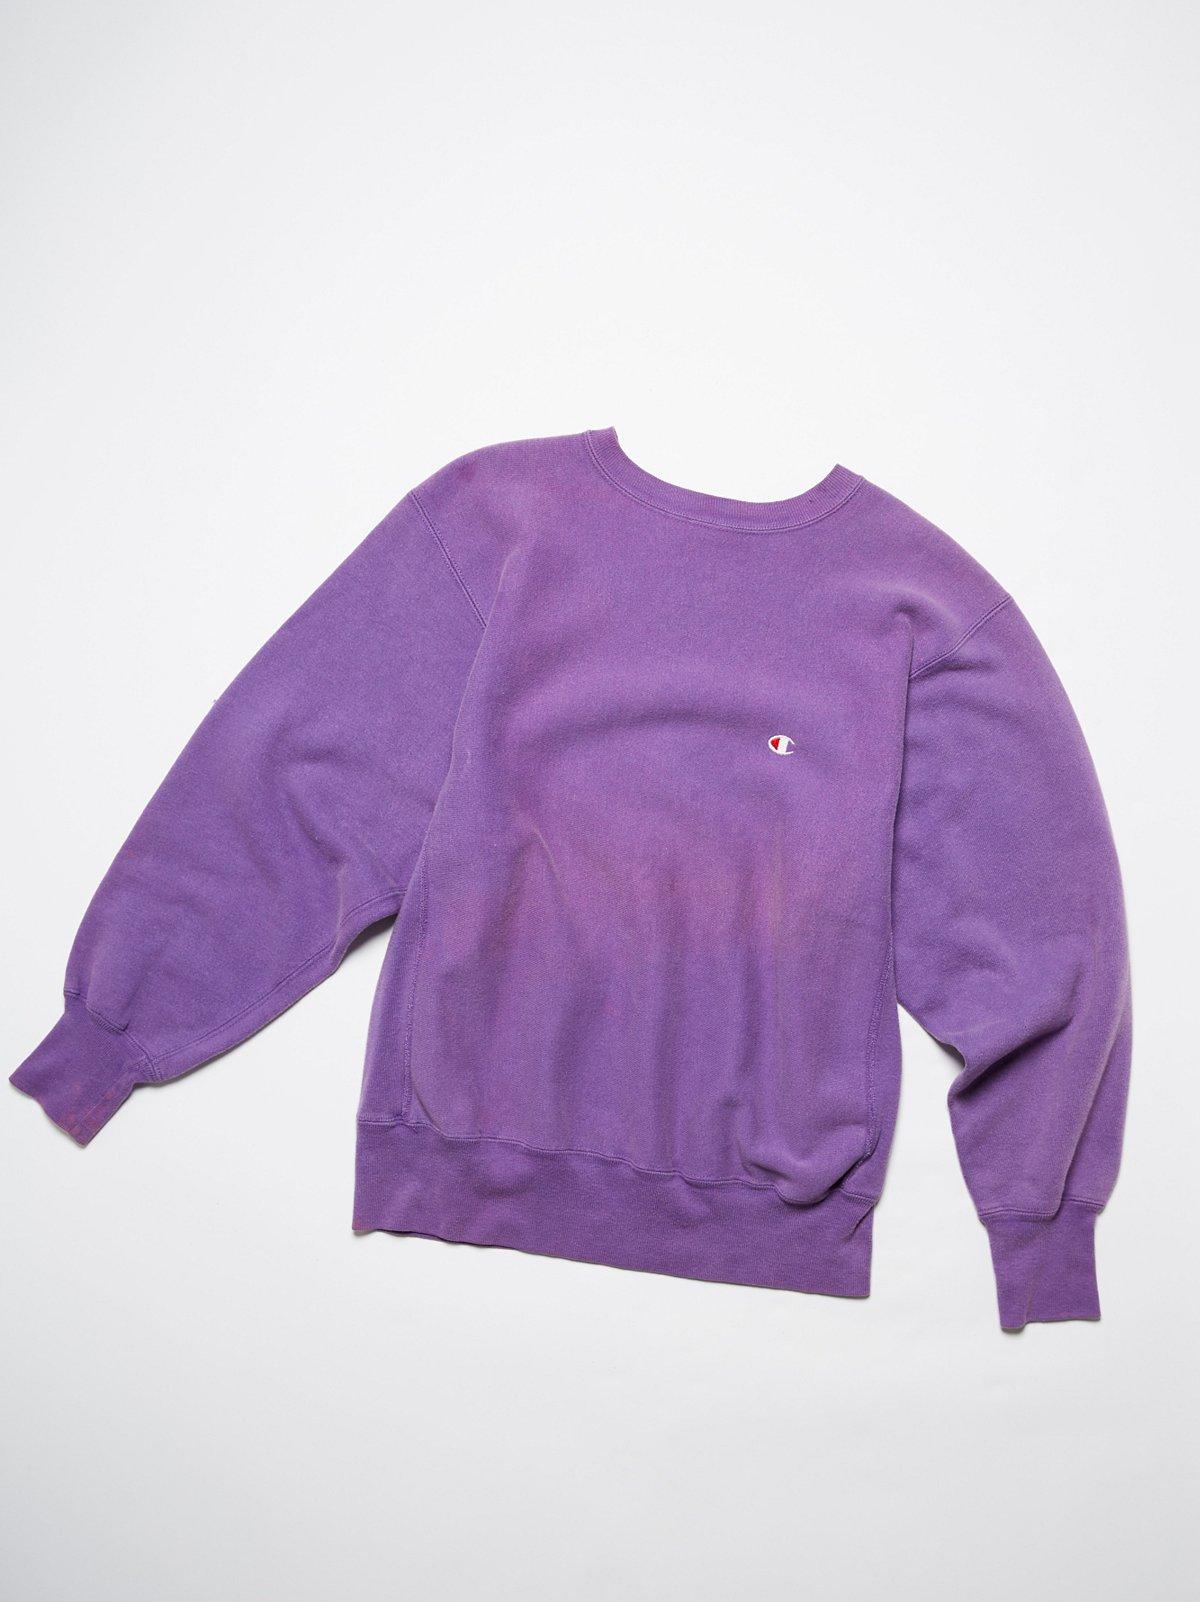 Vintage 1980s Champions Sweatshirt